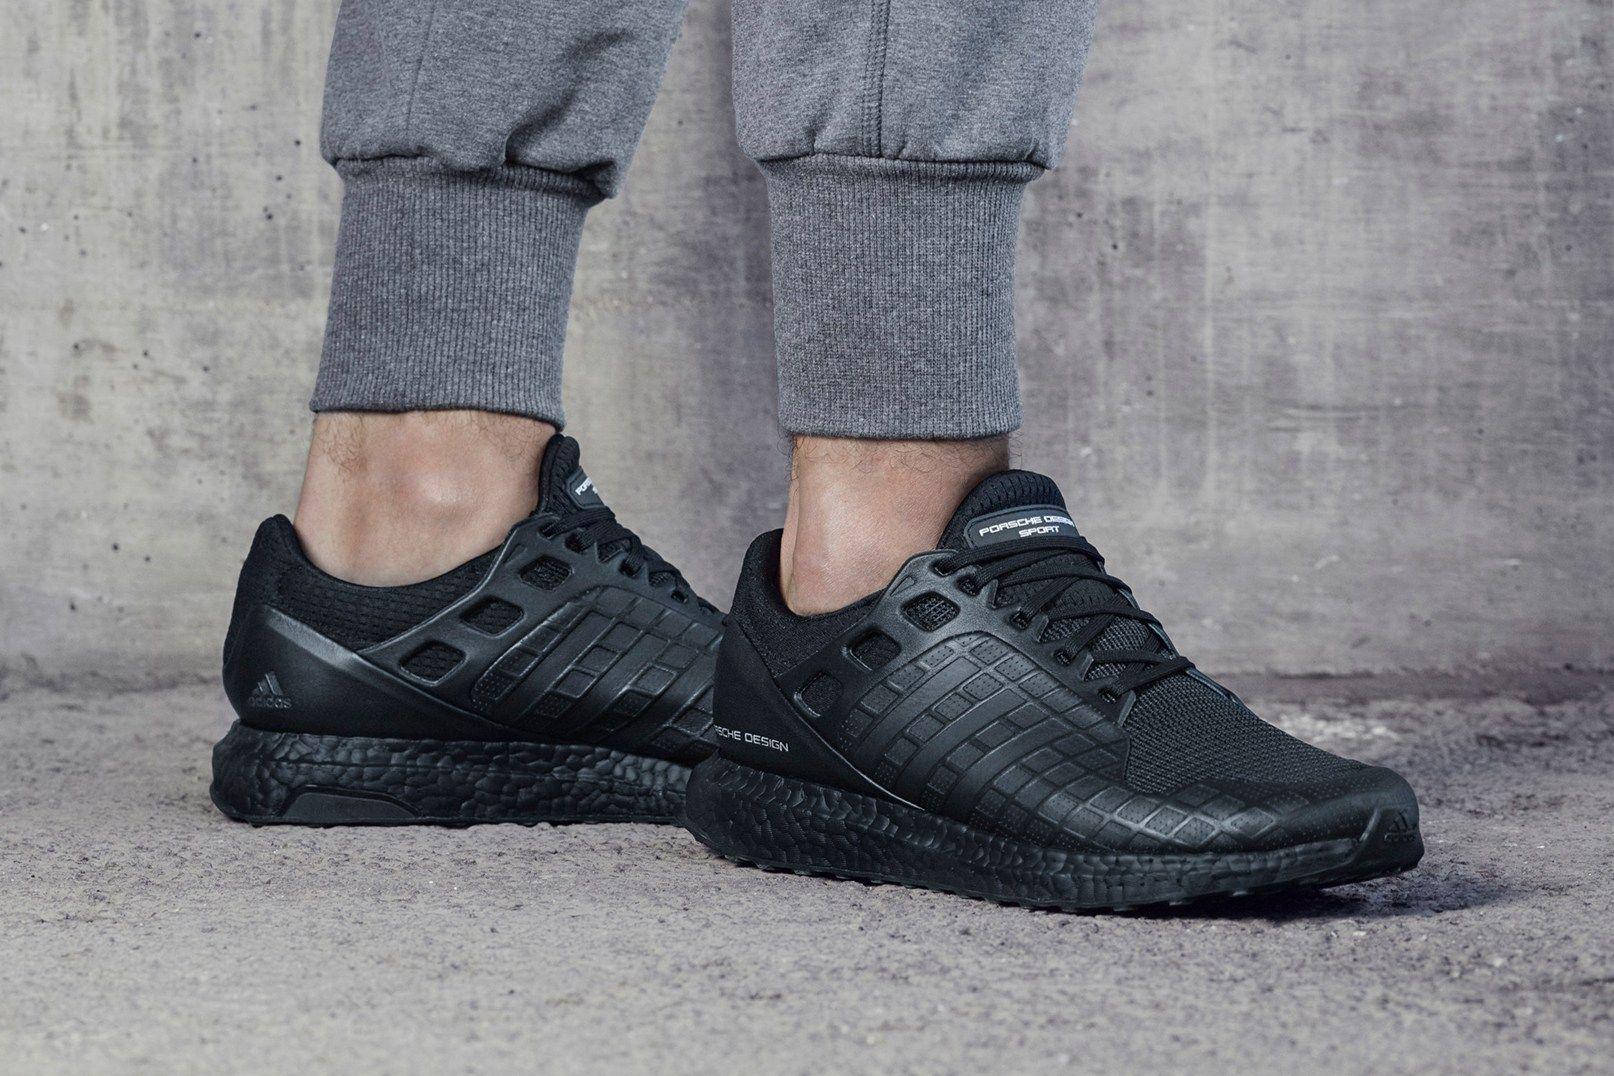 uk adidas porsche design ultra boost trainer black 1e5a2 c1917